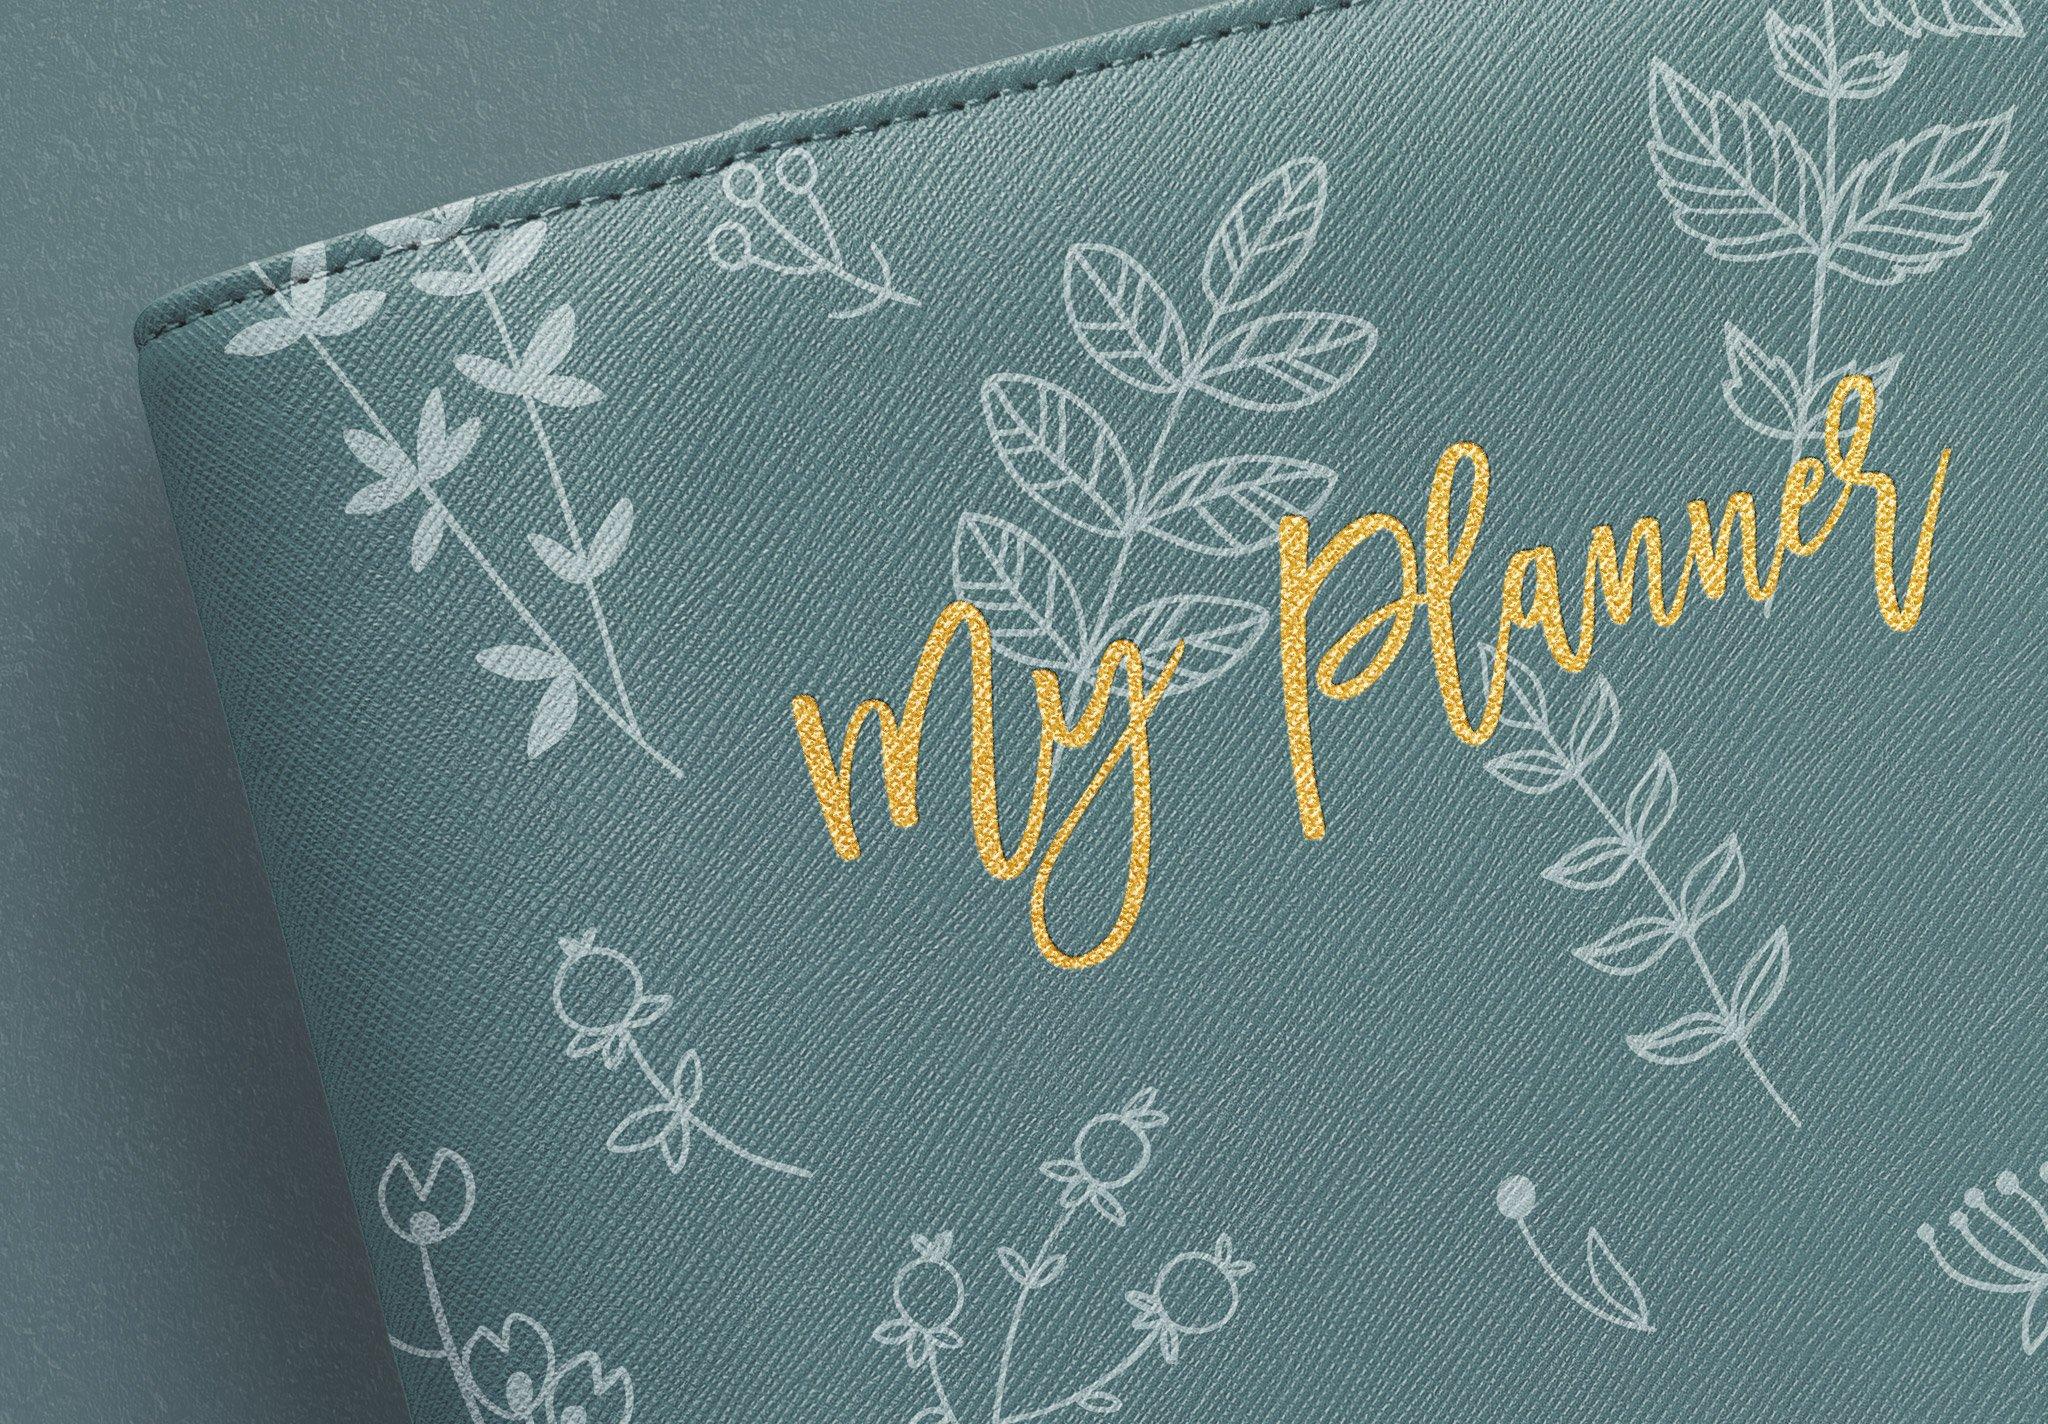 Planner Binder Front Cover Image04